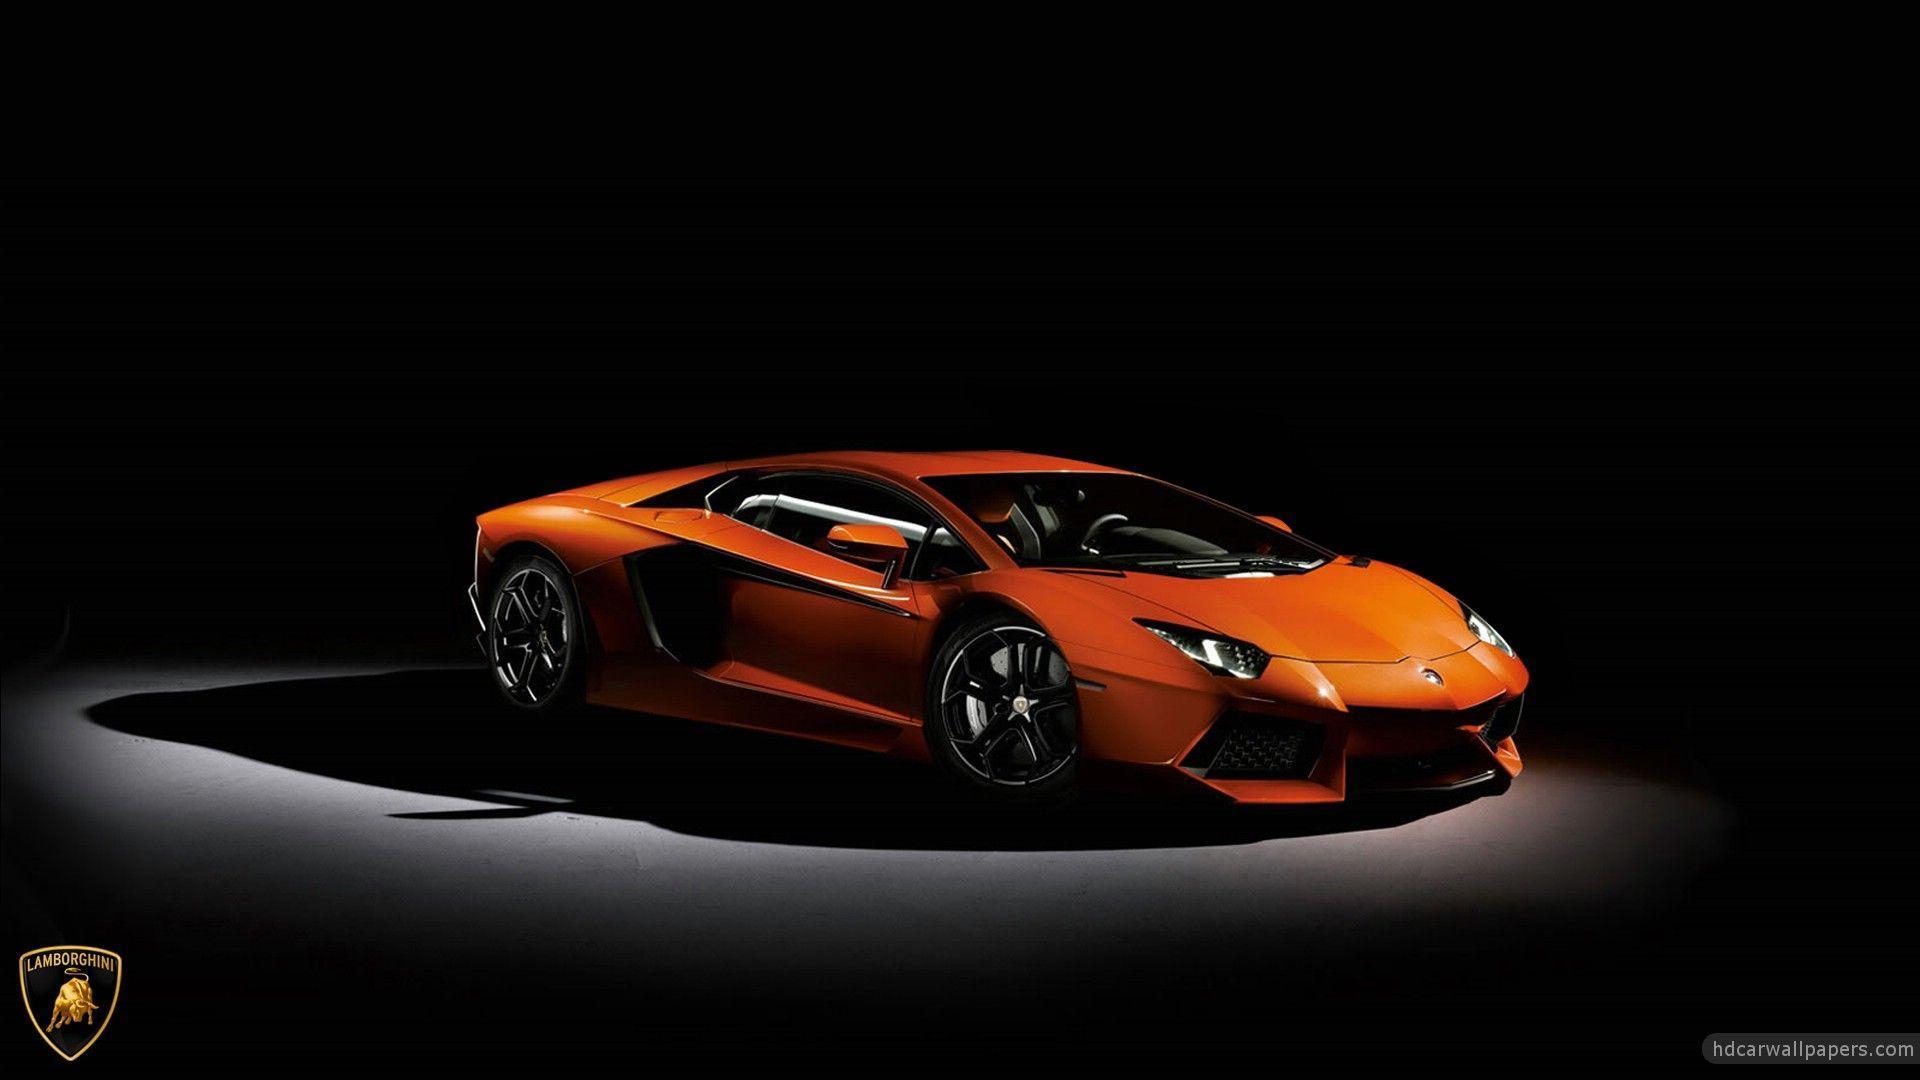 Lamborghini Desktop Backgrounds - Wallpaper Cave